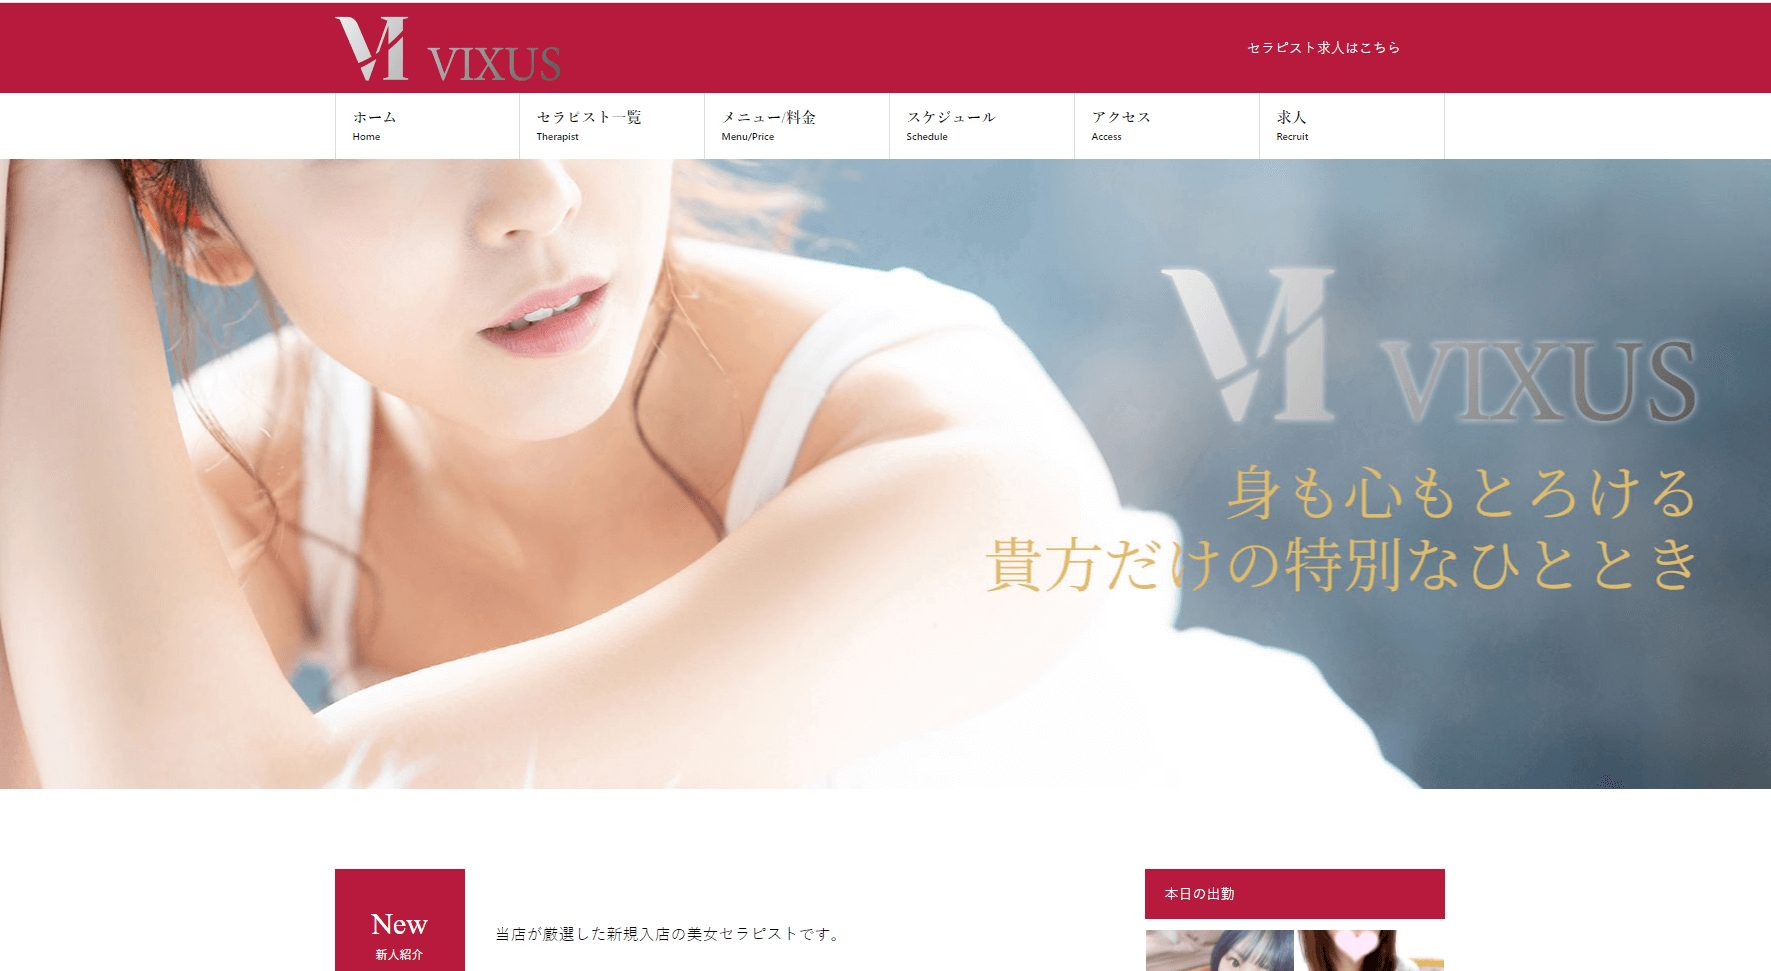 Vixus(ヴィクサス)